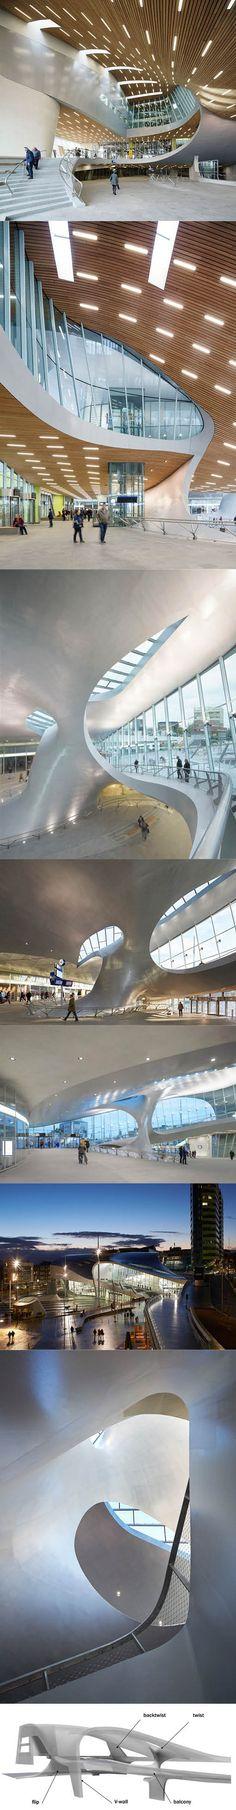 1995-2015 Unstudio - Centraal Station Arnhem / NL / steel glass wood concrete / transportation / parametric